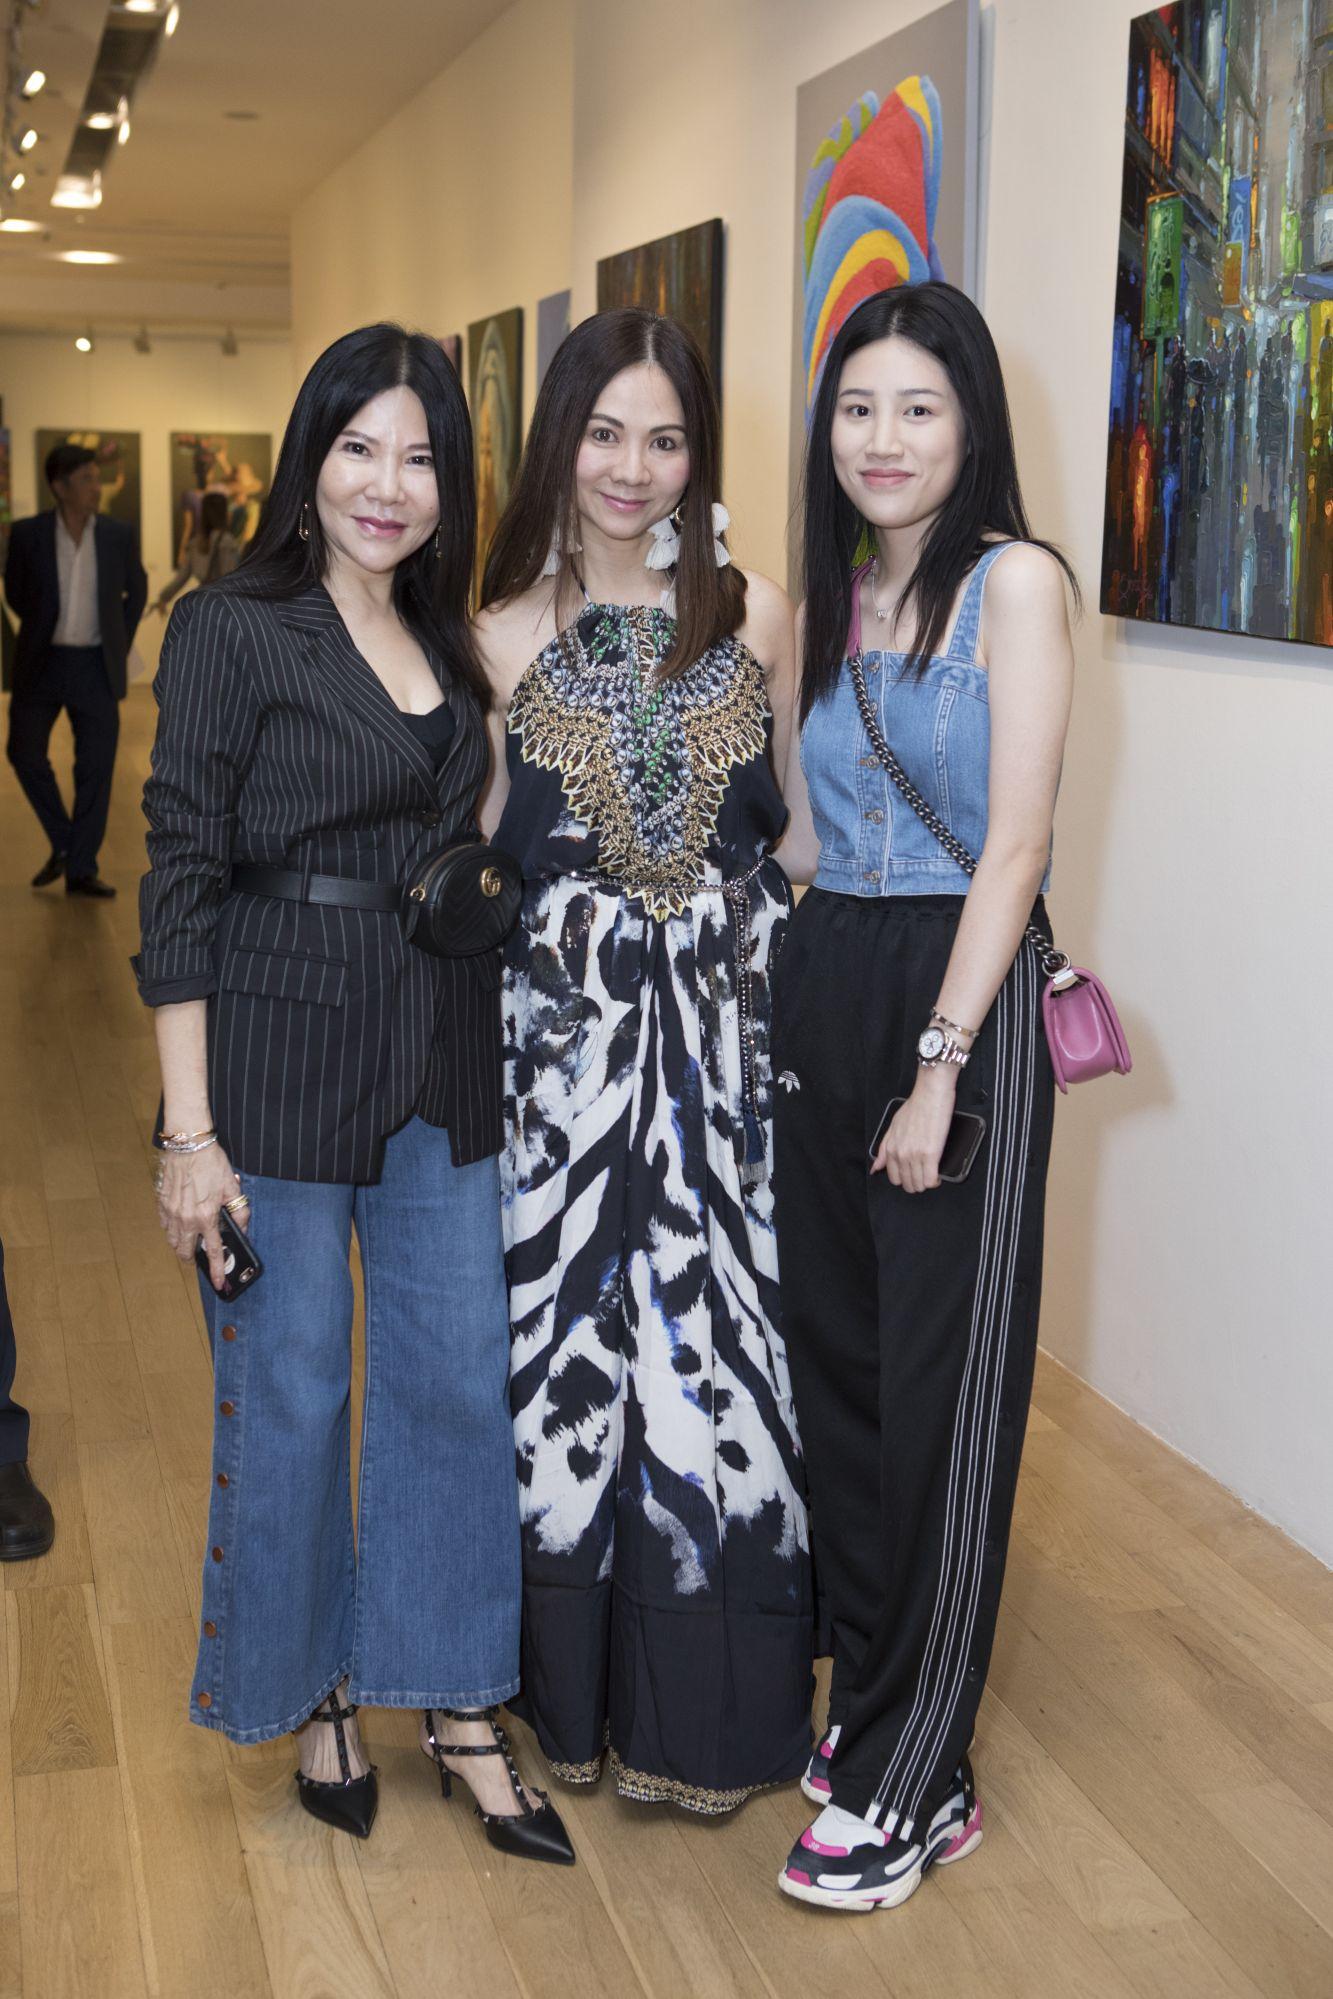 Jane Heng, Jacelyn Lai, Heng Shiqi